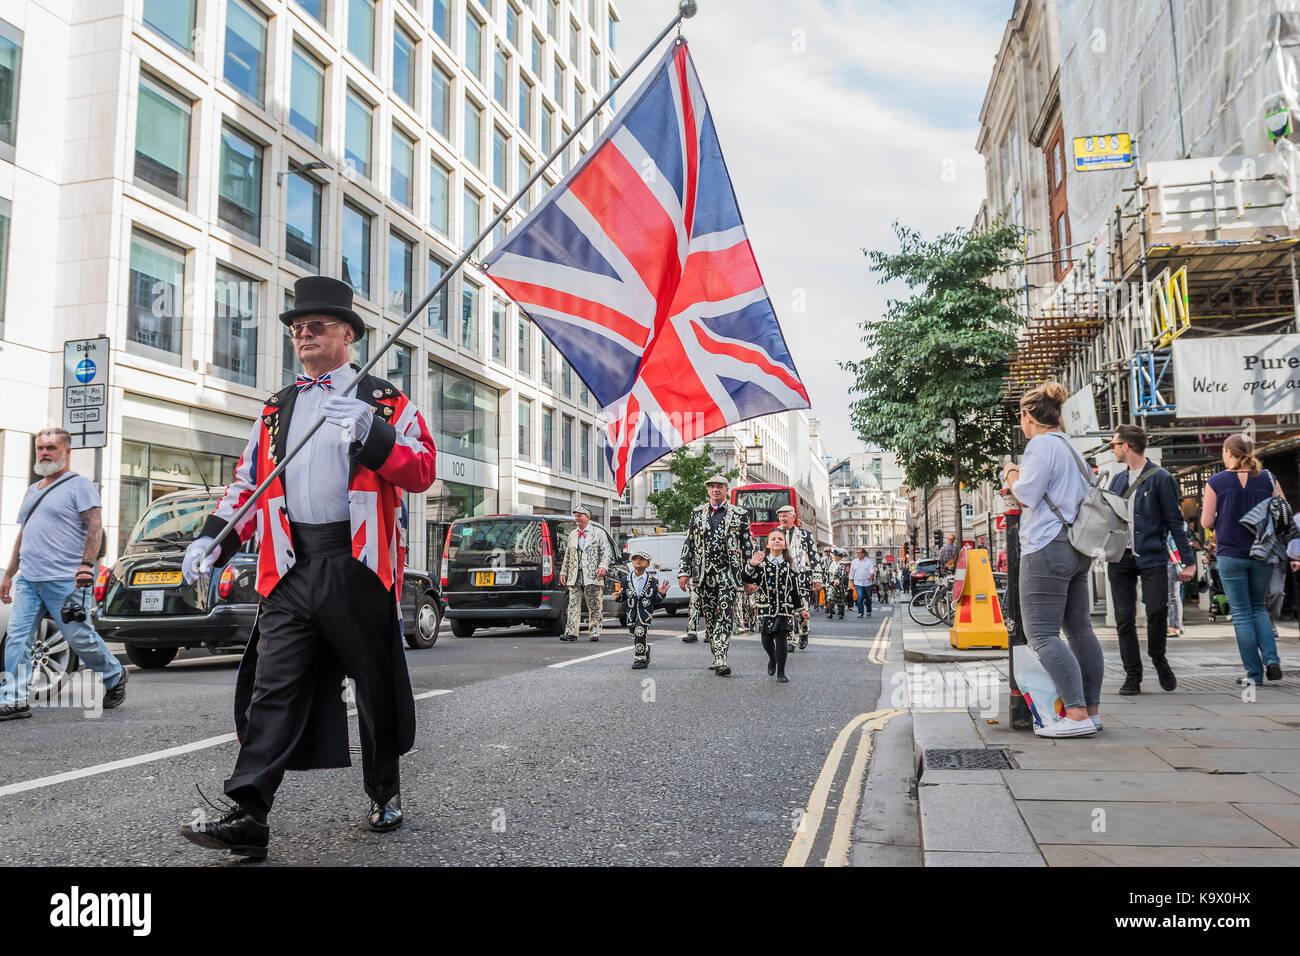 Londres, Reino Unido. 24 de setembro de 2017. marchando para st mary le Bow Church - o festival da colheita anual Imagens de Stock